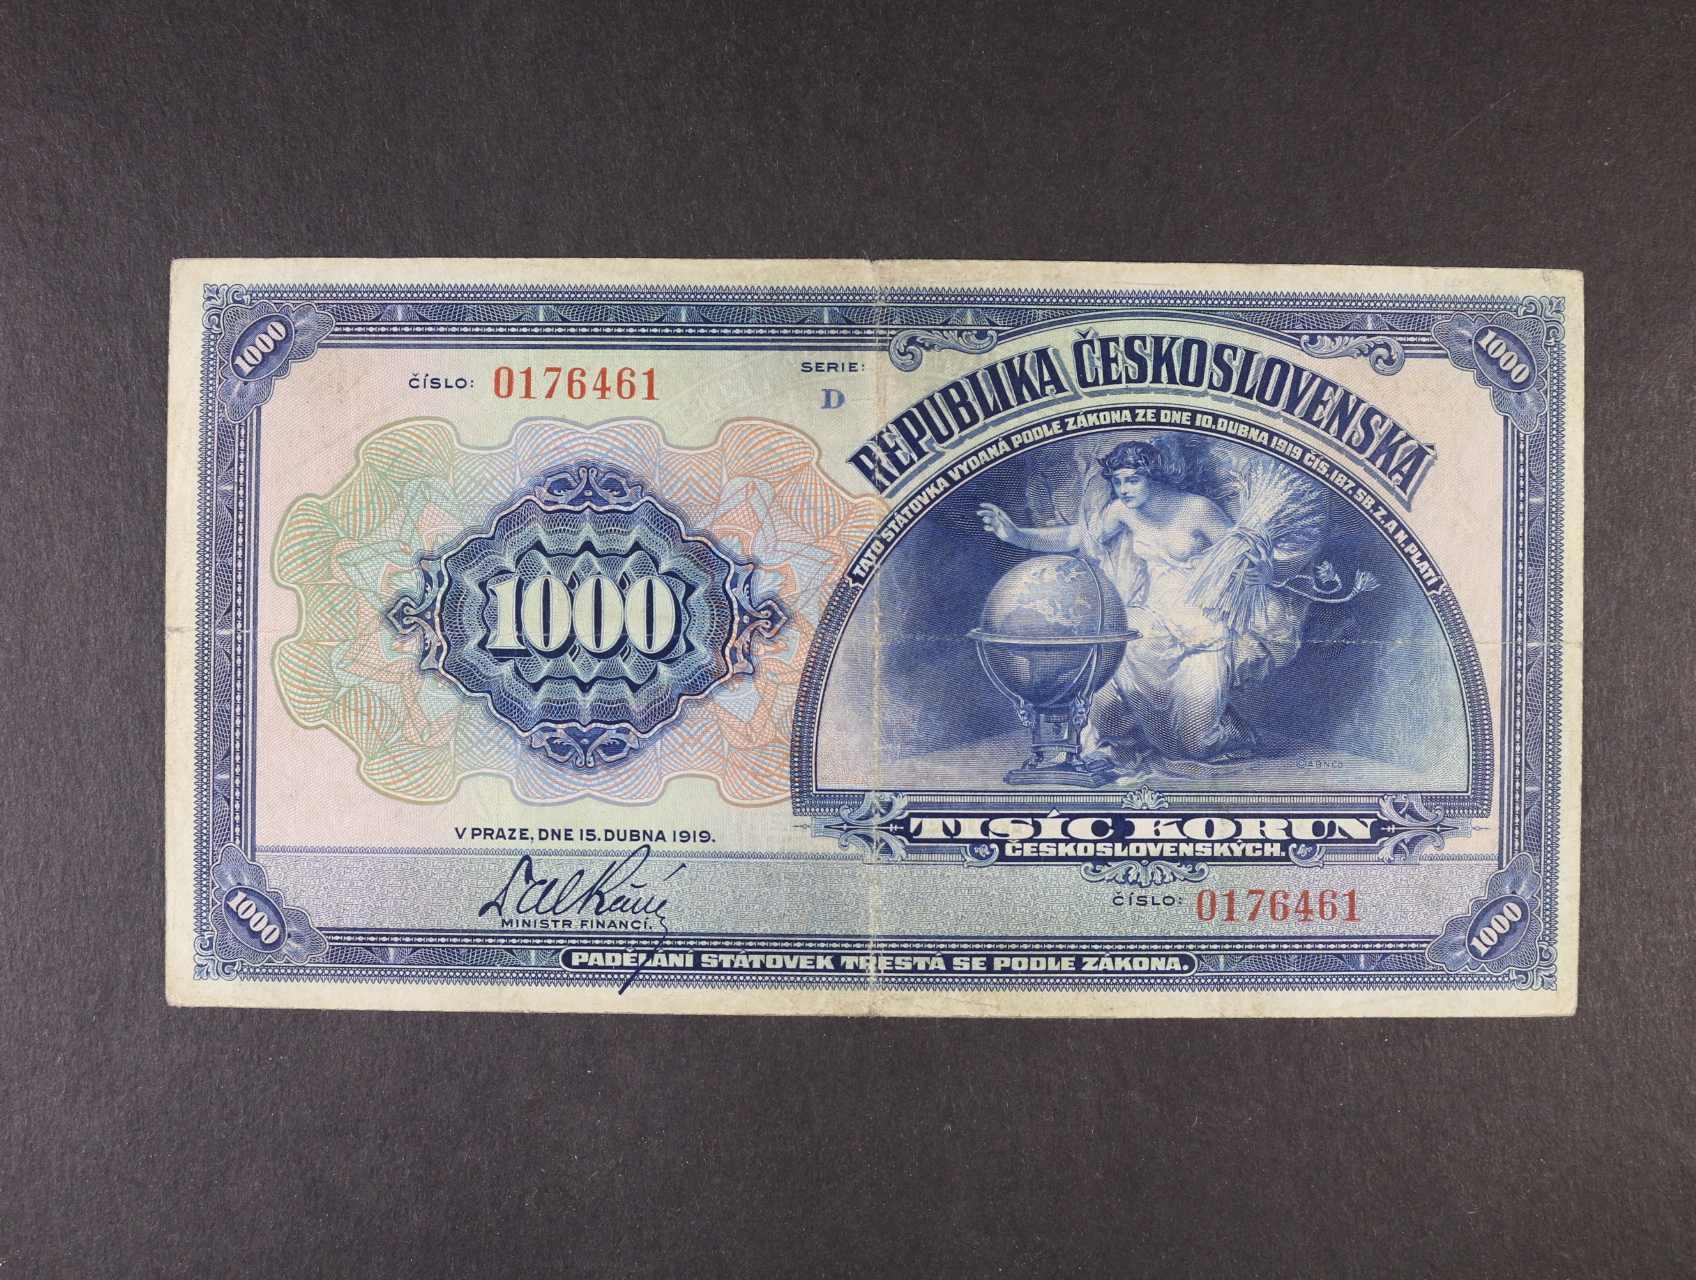 1000 Kč 15.4.1919 série D, Ba. 14, Pi. 13